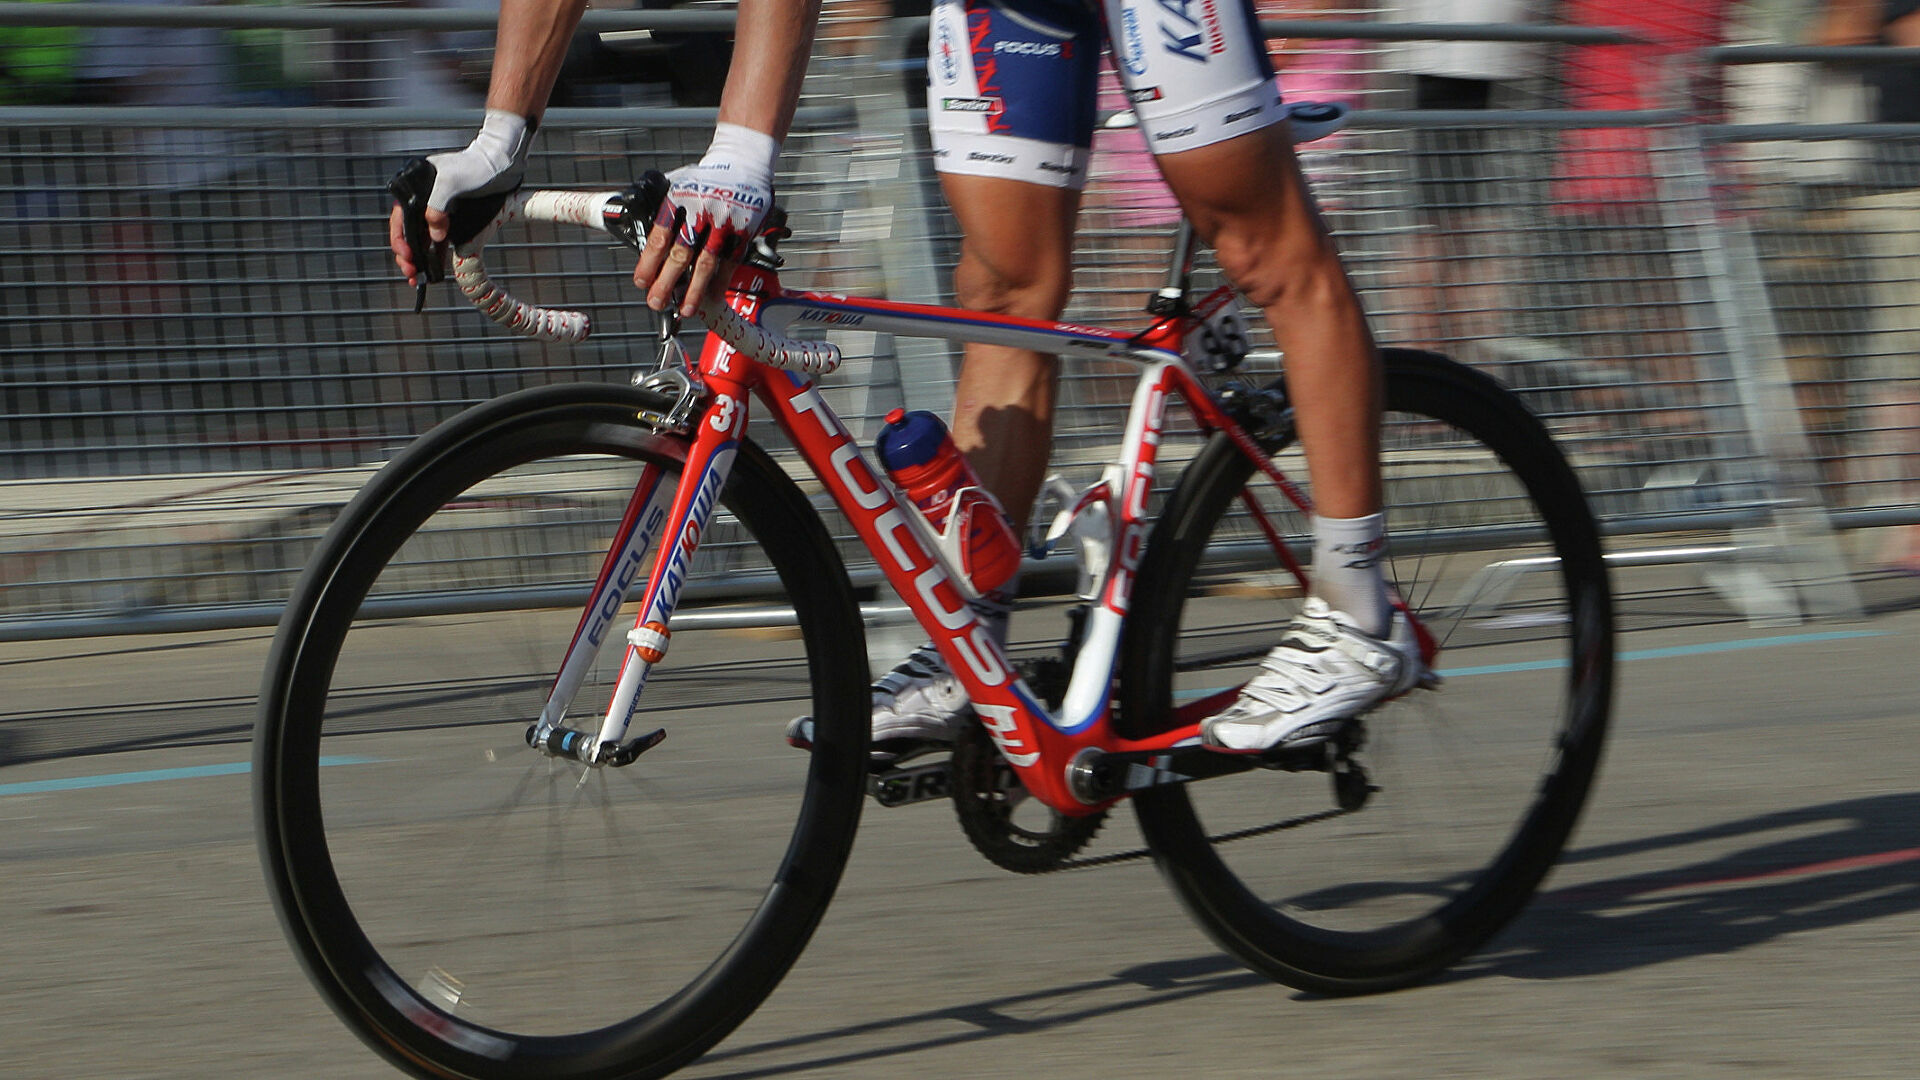 Экс-гонщик «Астаны» выиграл 16 этап «Вуэльты»